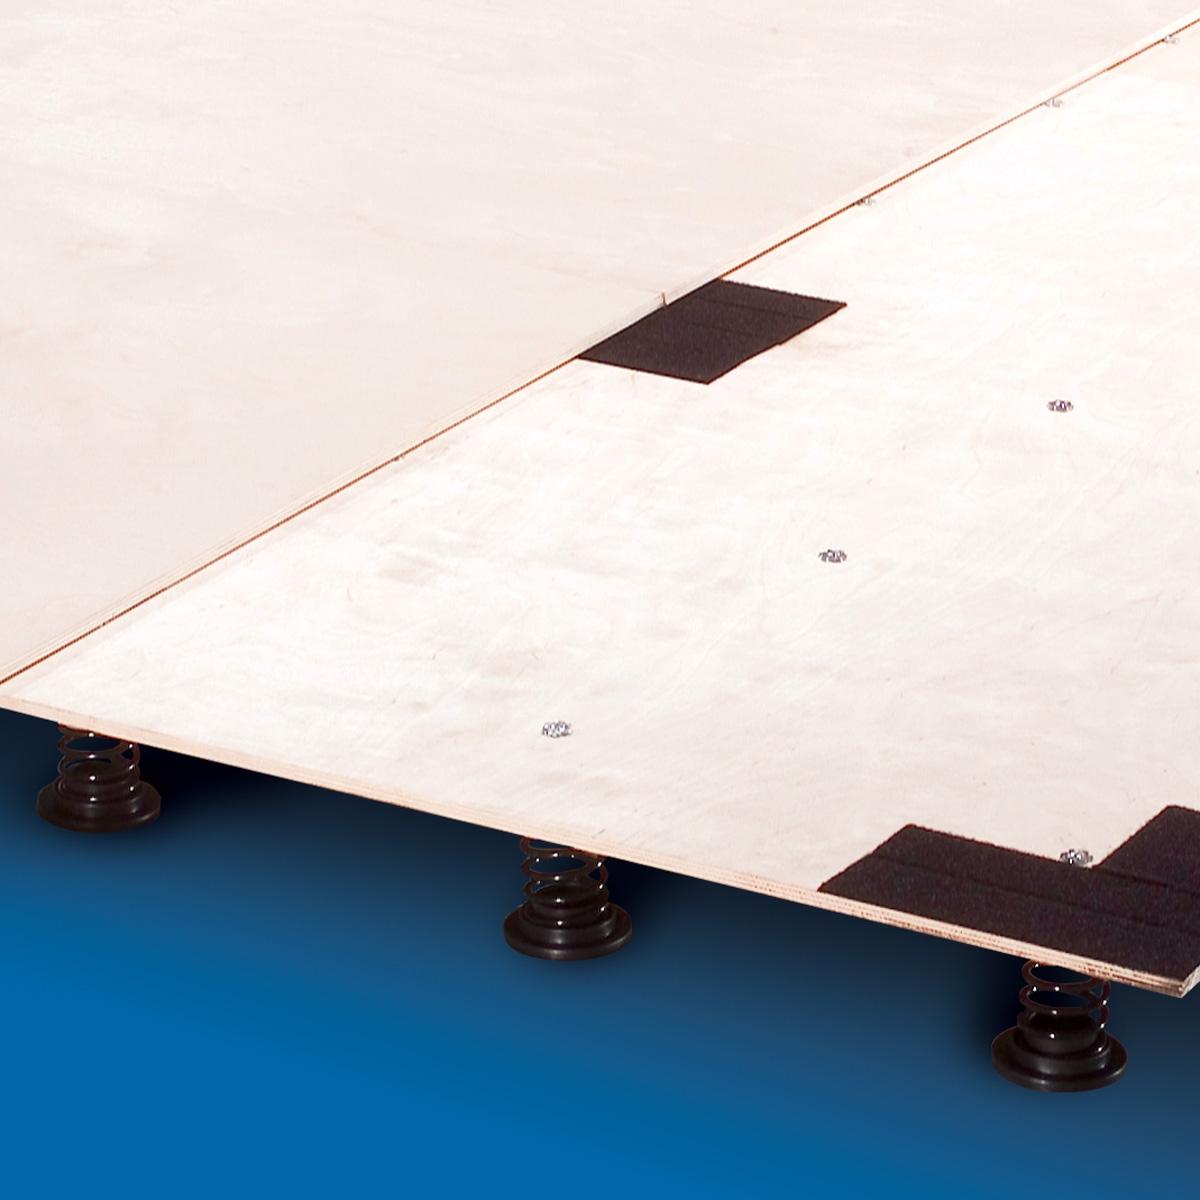 spring floor deck | gymnastics cheer | mancino mats